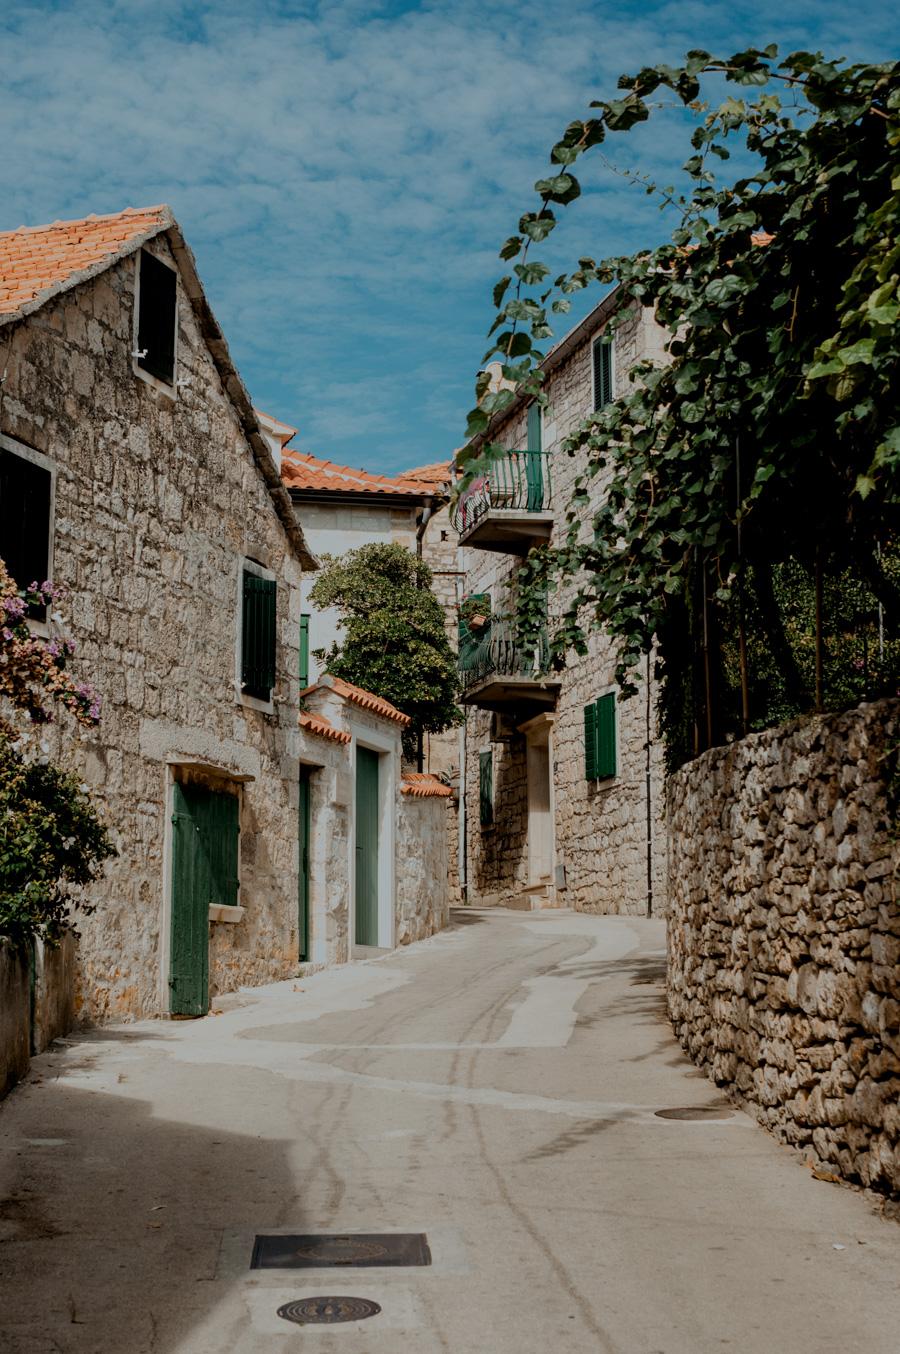 Croatian streets